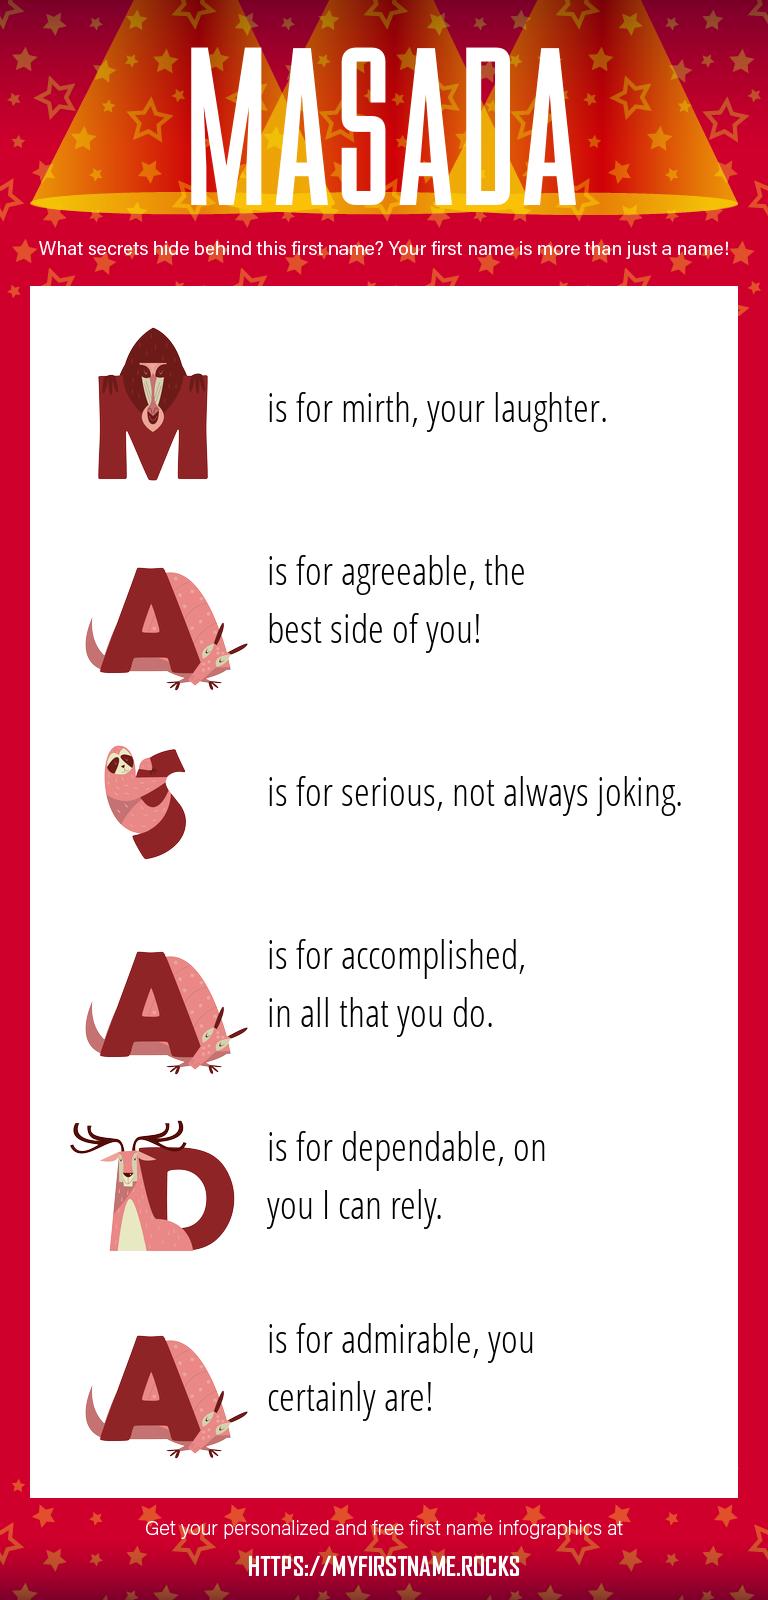 Masada Infographics